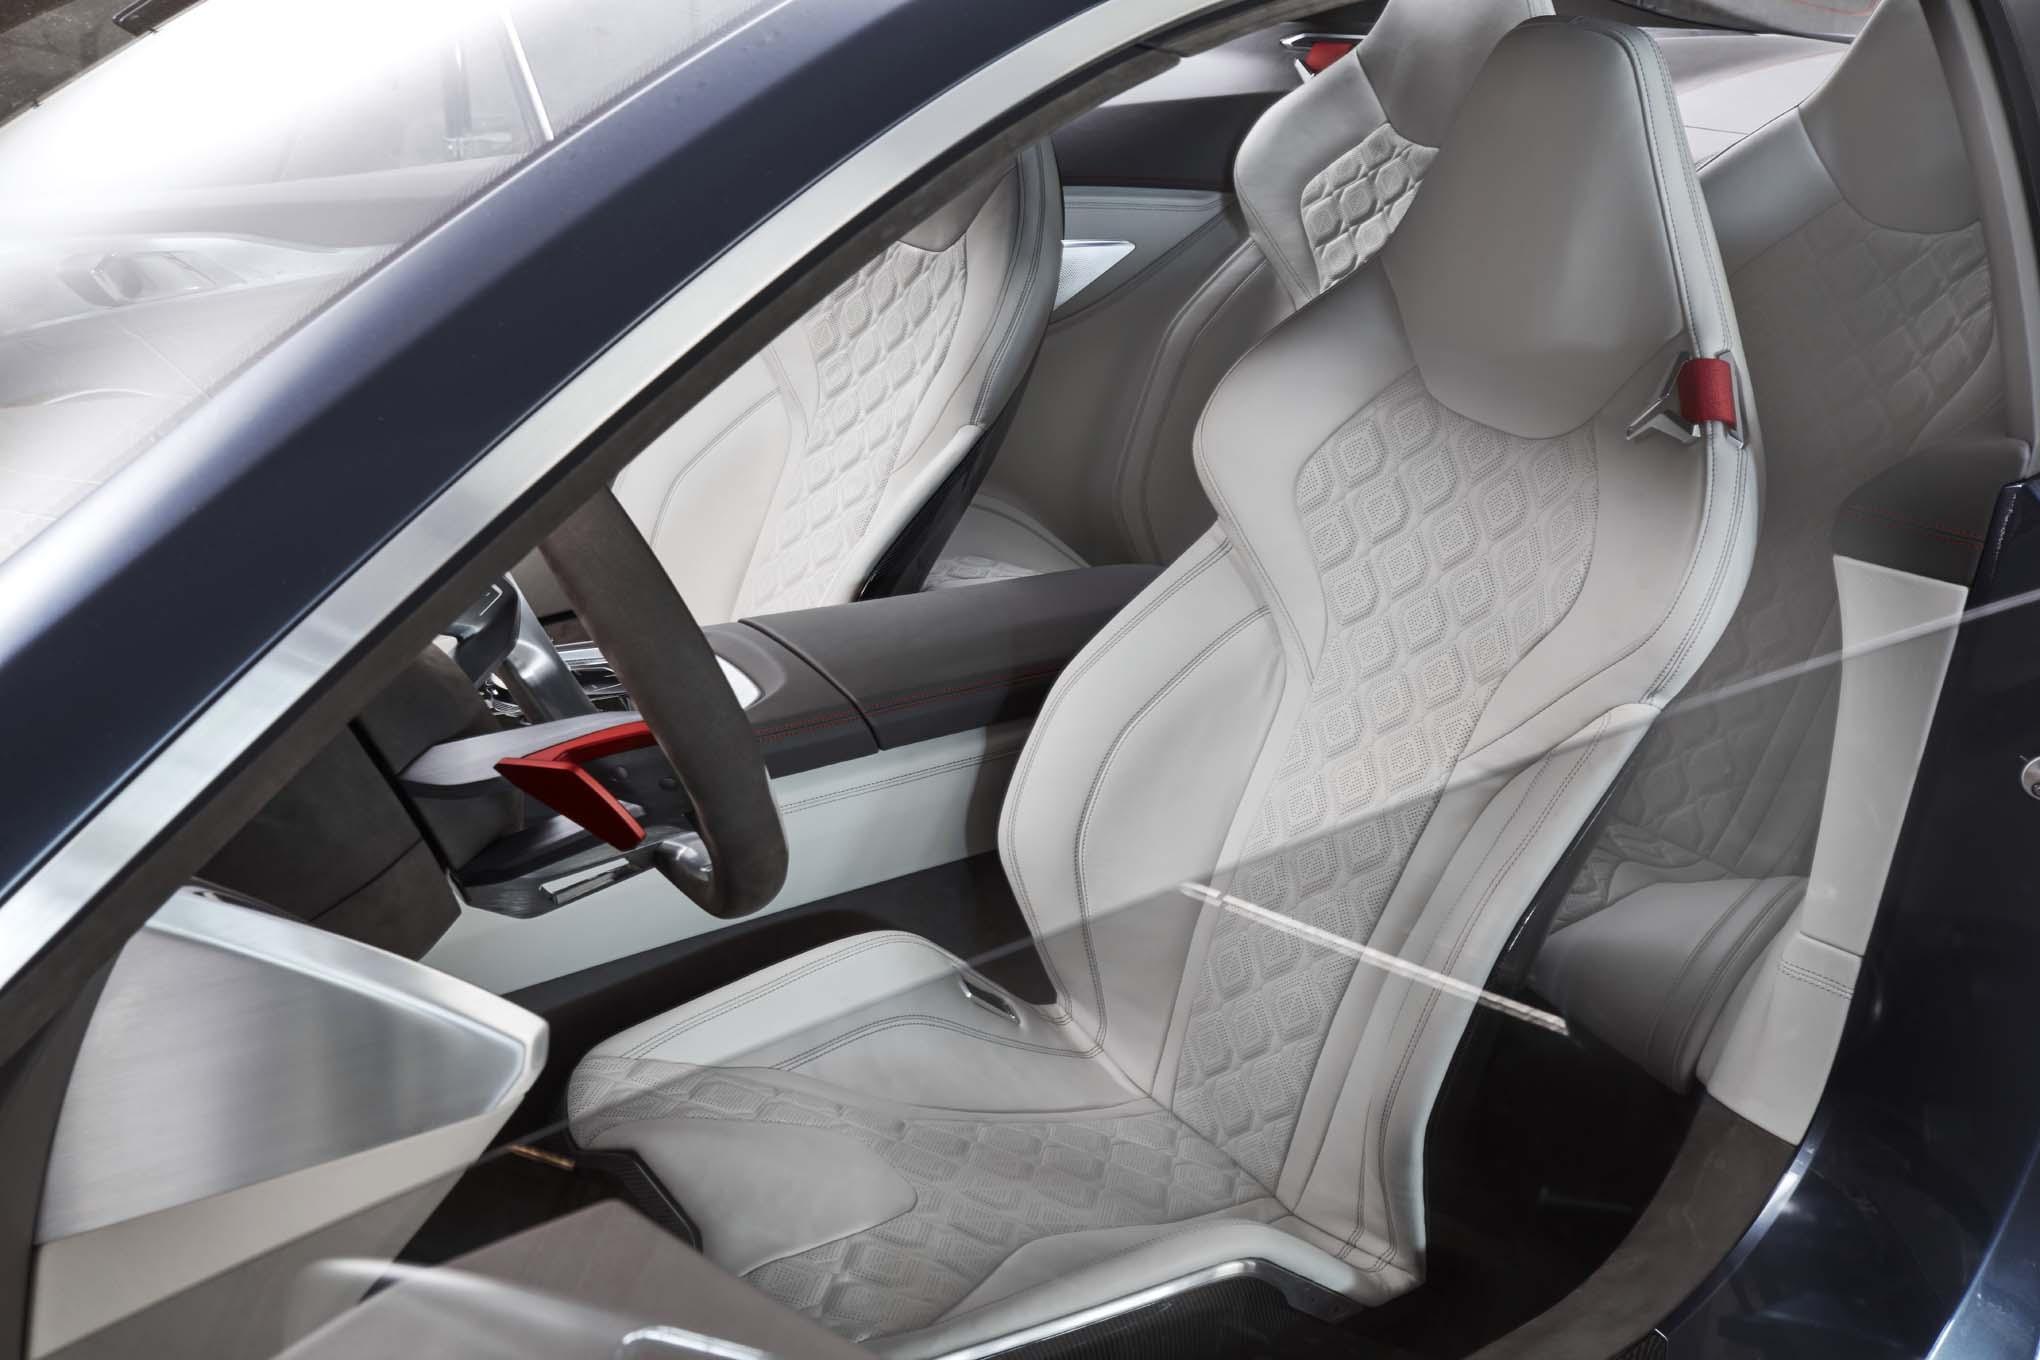 2018 Bmw Concept 8 Series Front Interior Seats 02 26 Mayo 2017 Miguel Cortina